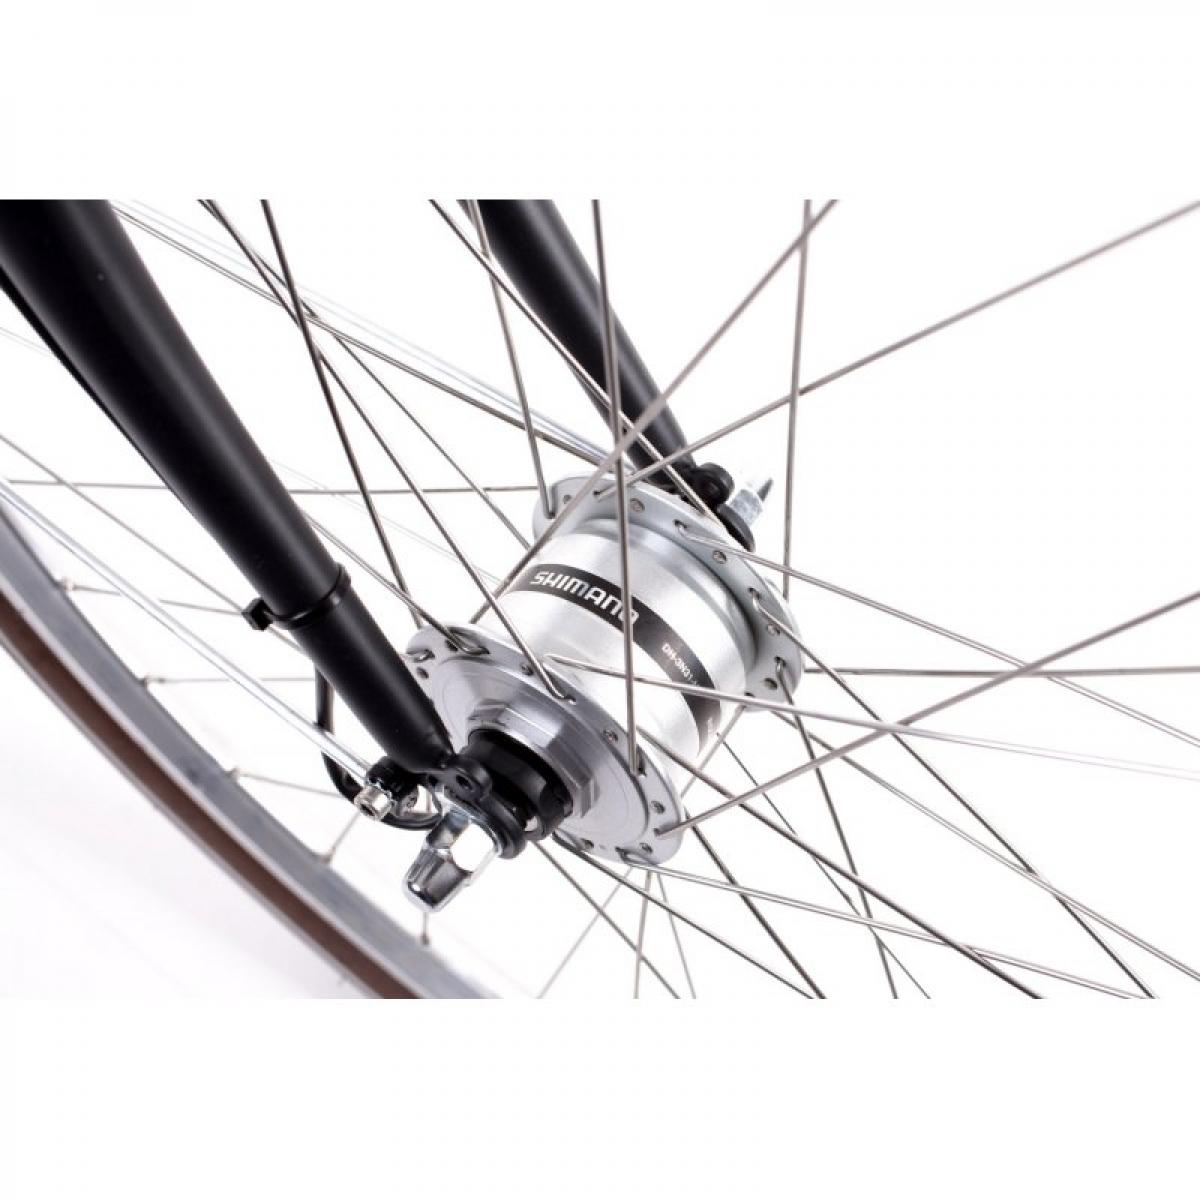 28 zoll alu damen mifa fahrrad 7 gang shimano nexus nabendynamo korb retro schwarz ihr. Black Bedroom Furniture Sets. Home Design Ideas